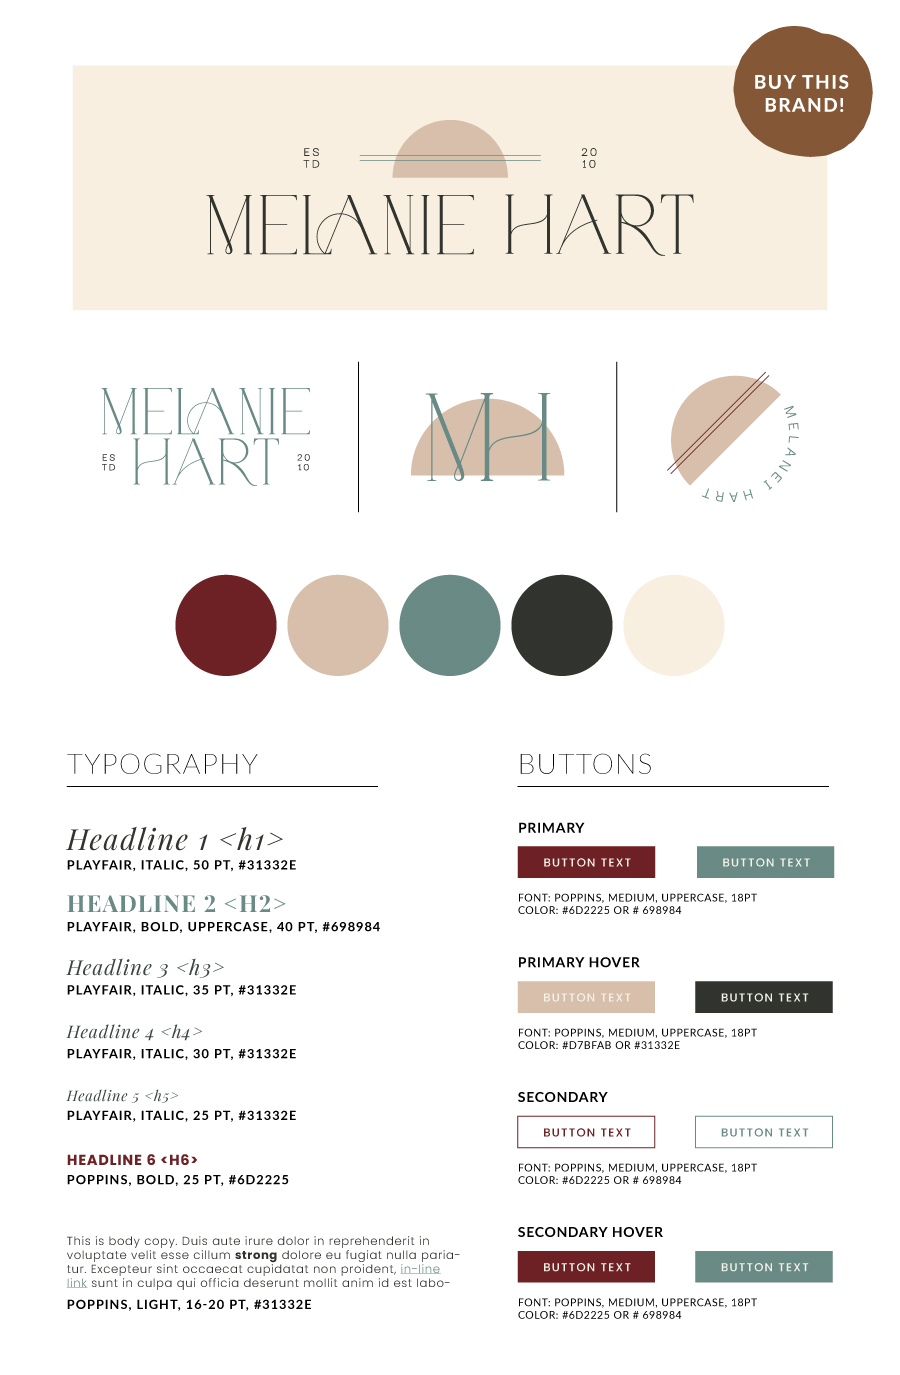 Melanie Hart Semi-Custom Brand Design | Witt and Company